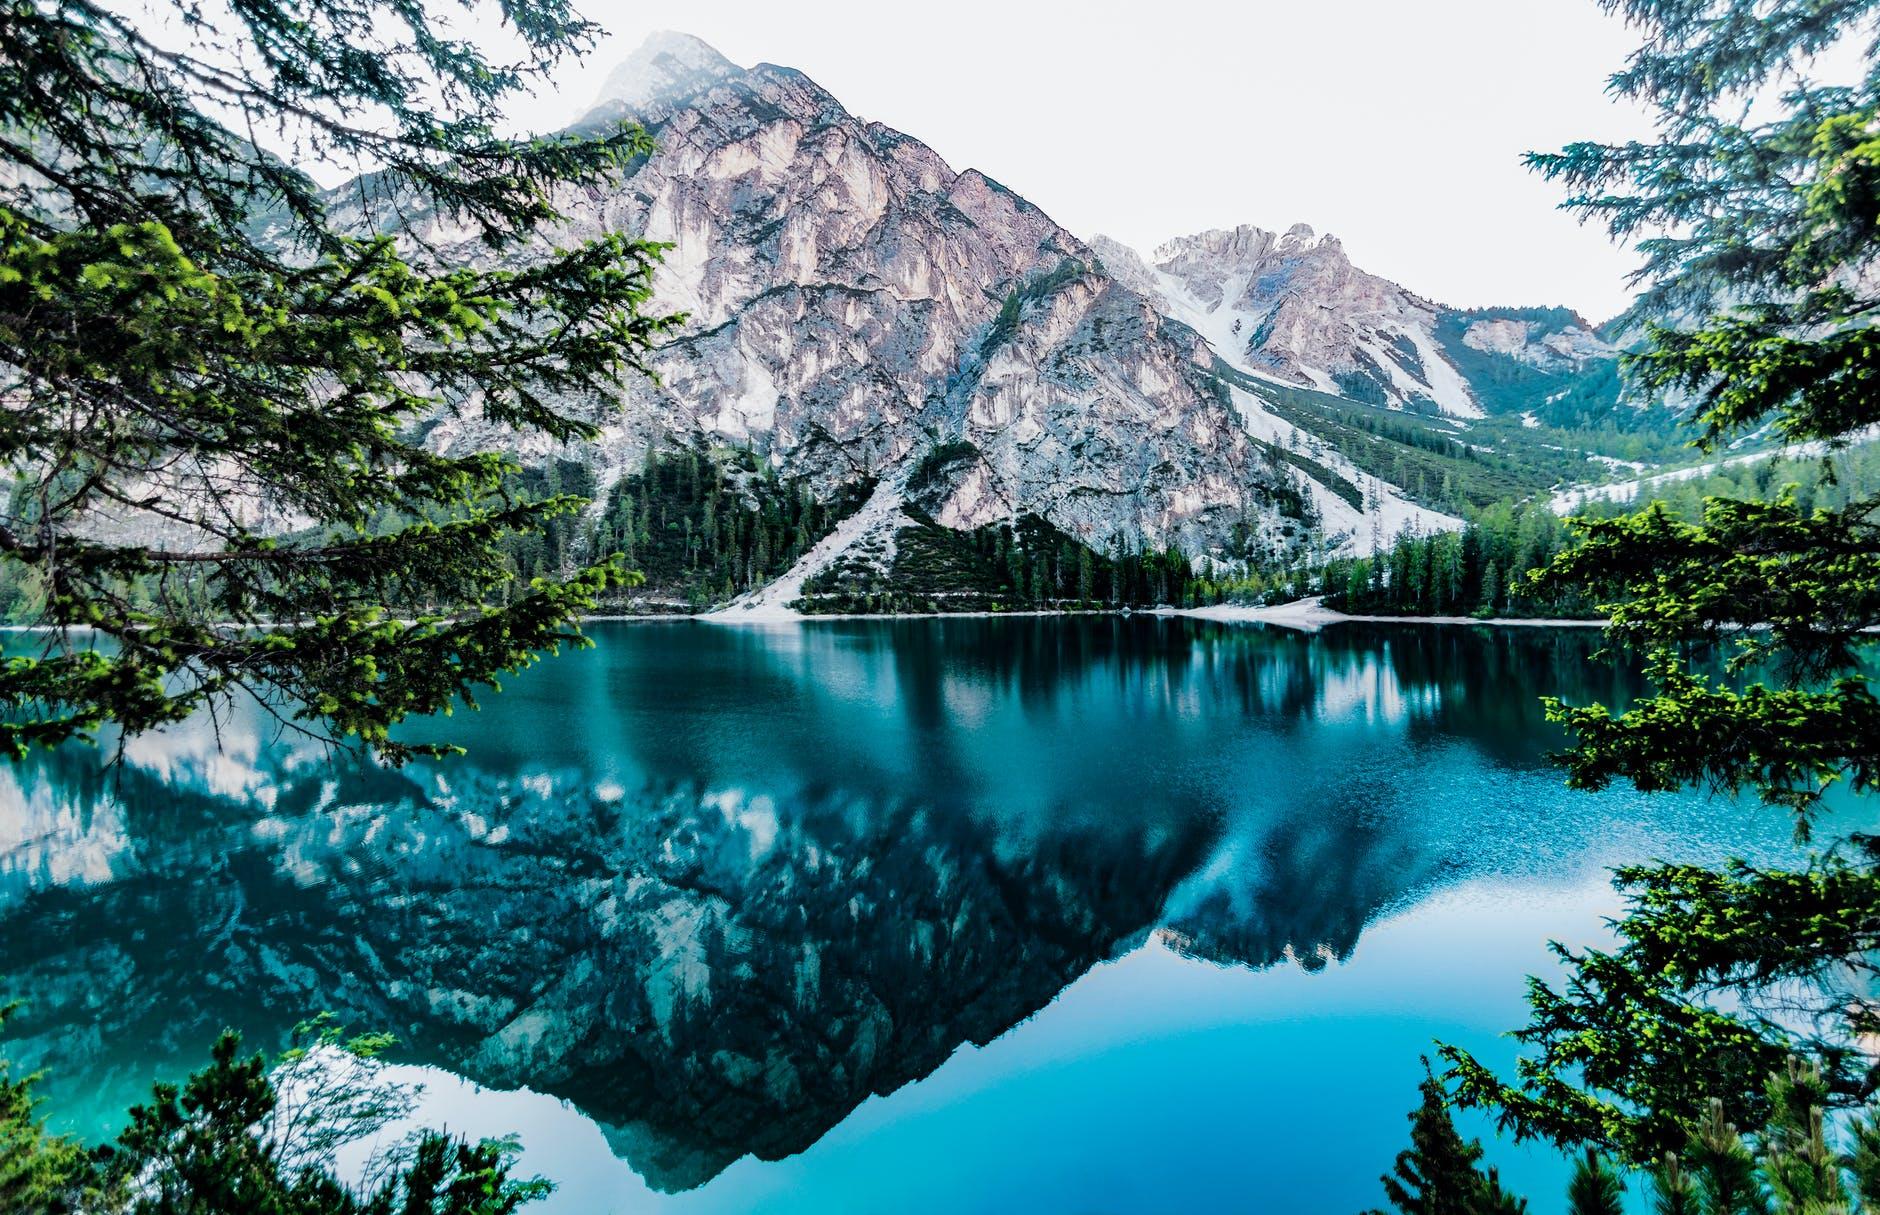 big mountain nature image